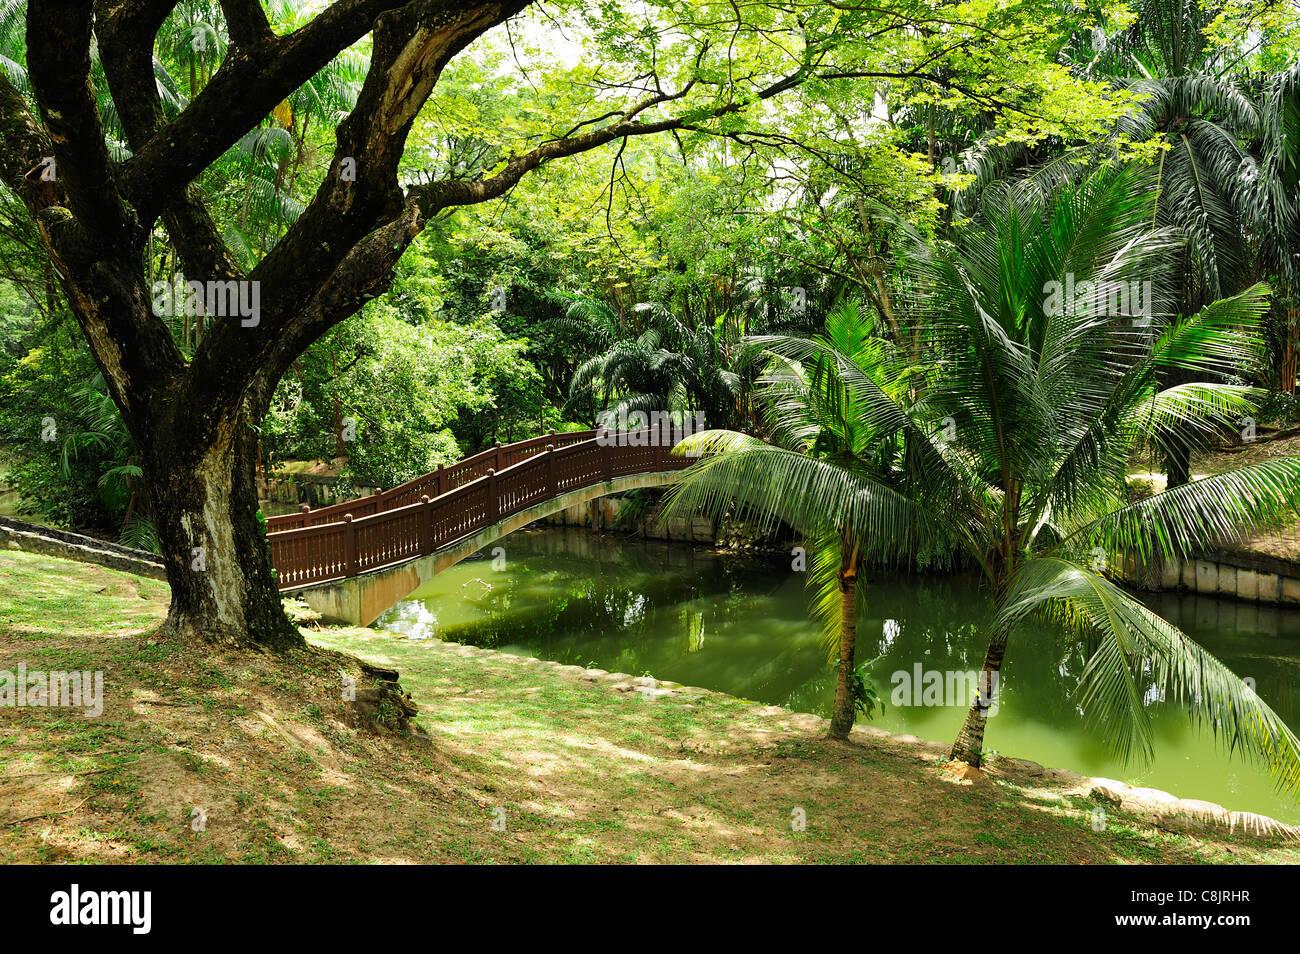 Lake Gardens (Taman Tasik Perdana), Kuala Lumpur, Malaysia - Stock Image